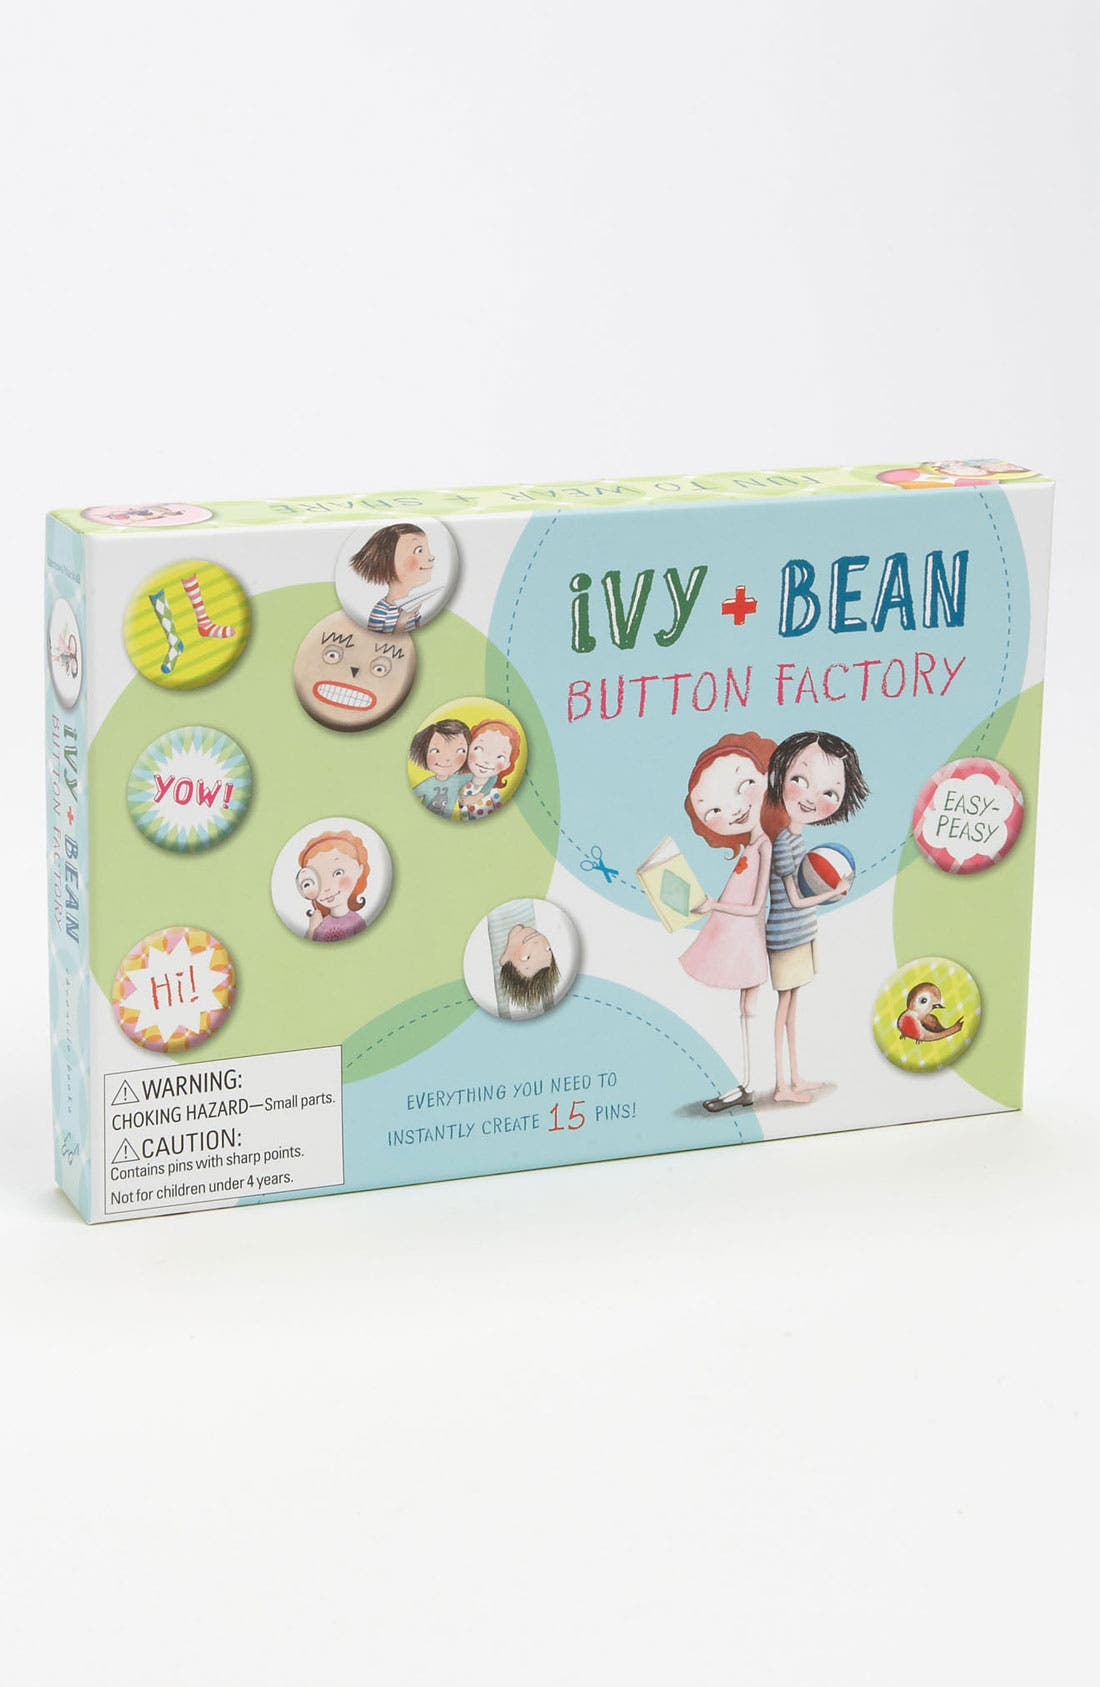 Main Image - Annie Barrows & Sophie Blackall 'Ivy + Bean' Button Factory